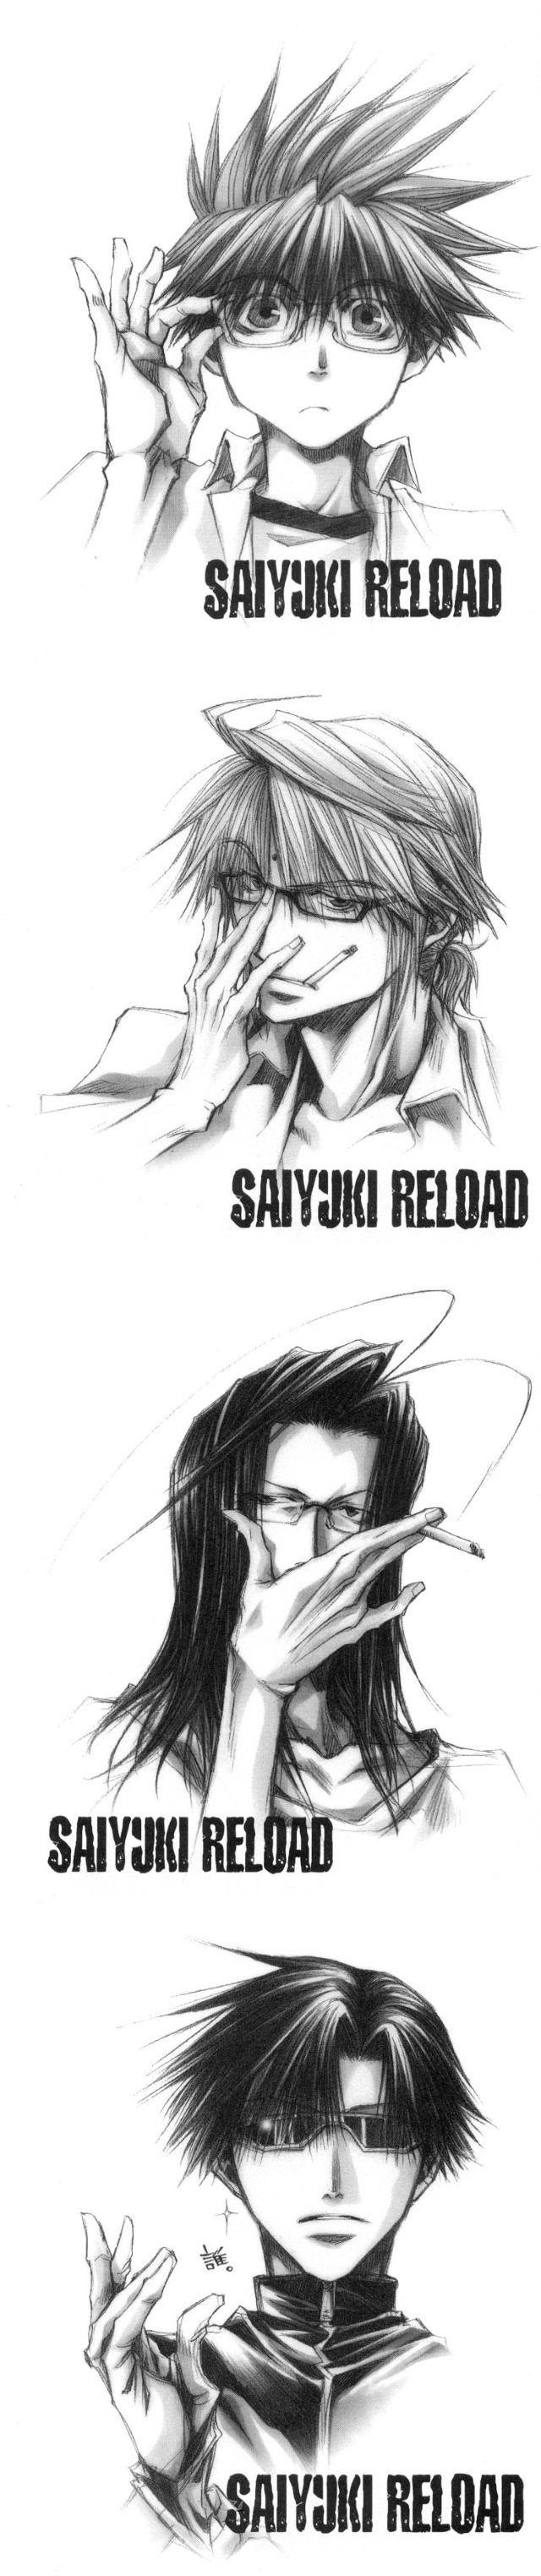 Saiyuki Reload